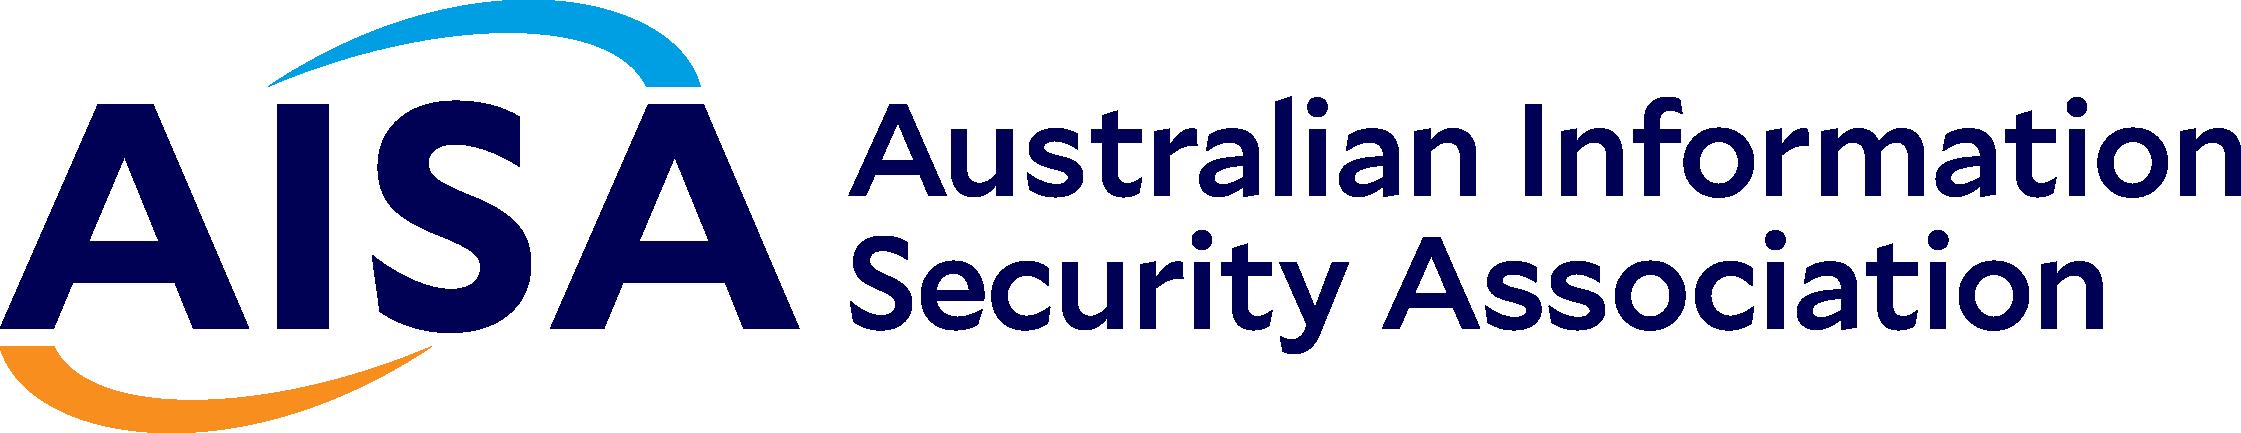 AISA logo.png